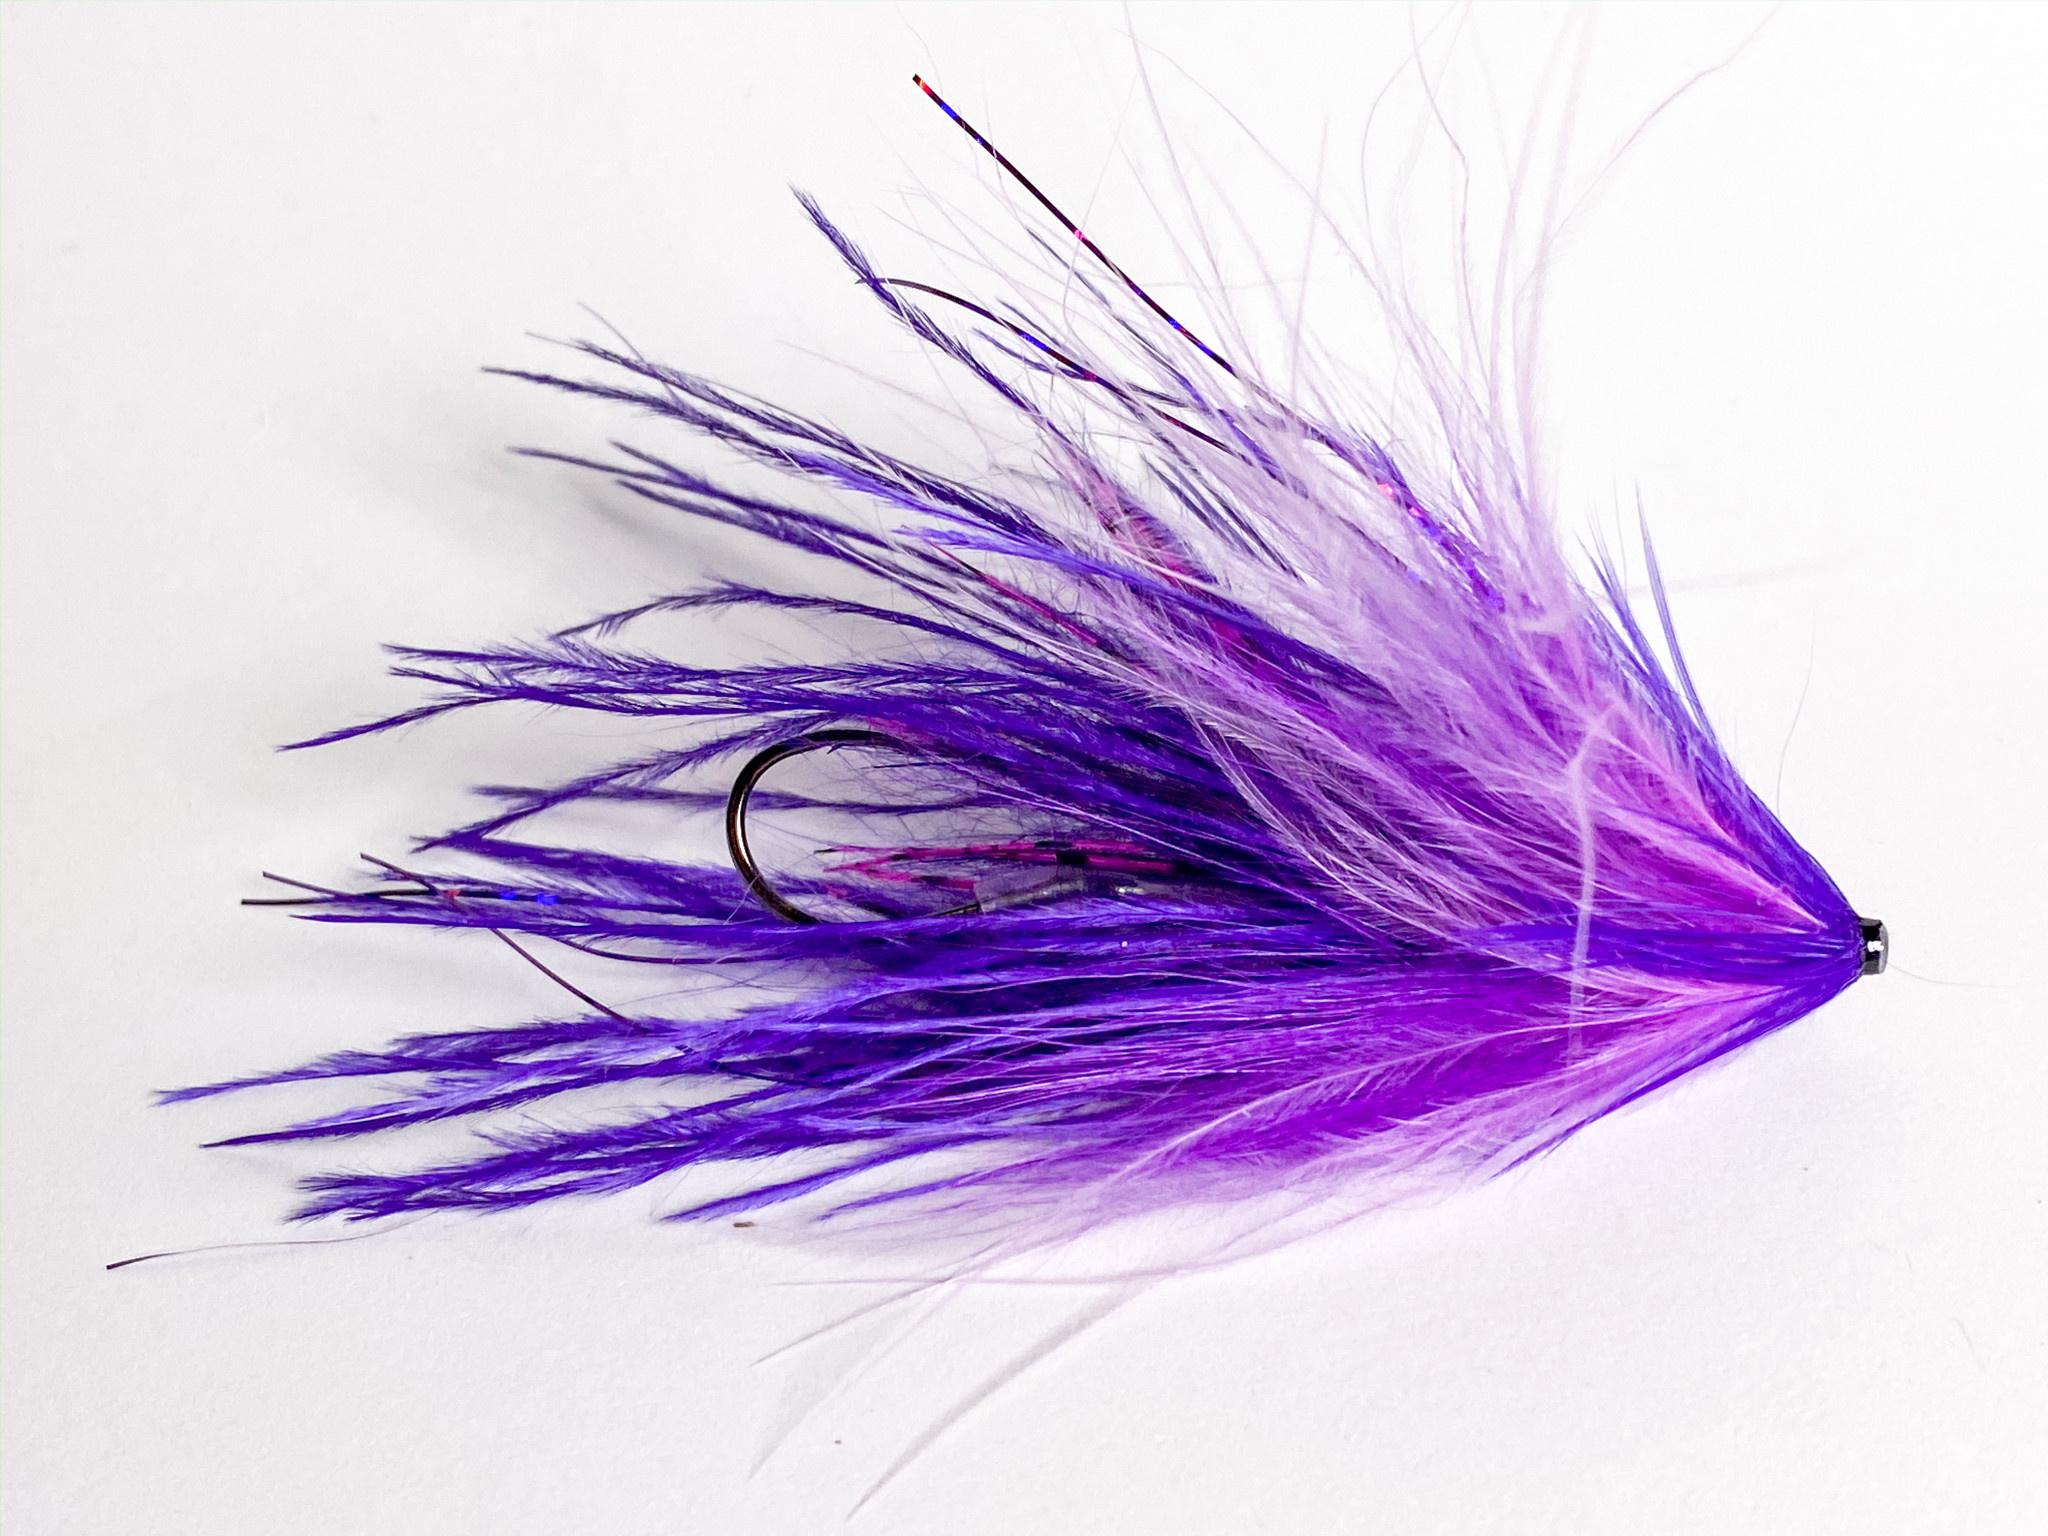 Aqua Flies Jason Osborn's Sputnik Tube Intruder